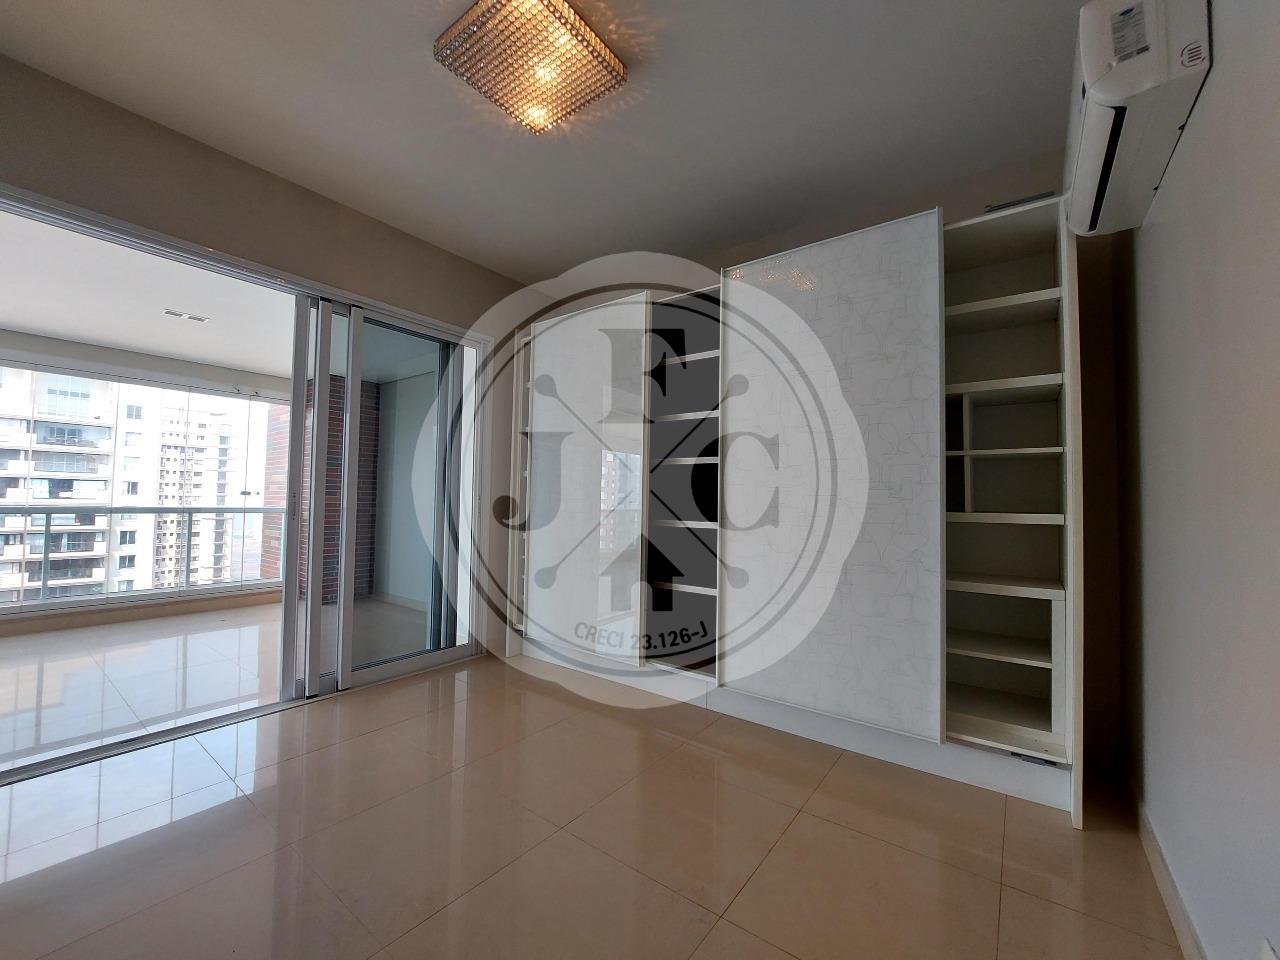 Apartamento para aluguel no Residencial Morro do Ipê: Sala de Almoço Vista Sacada